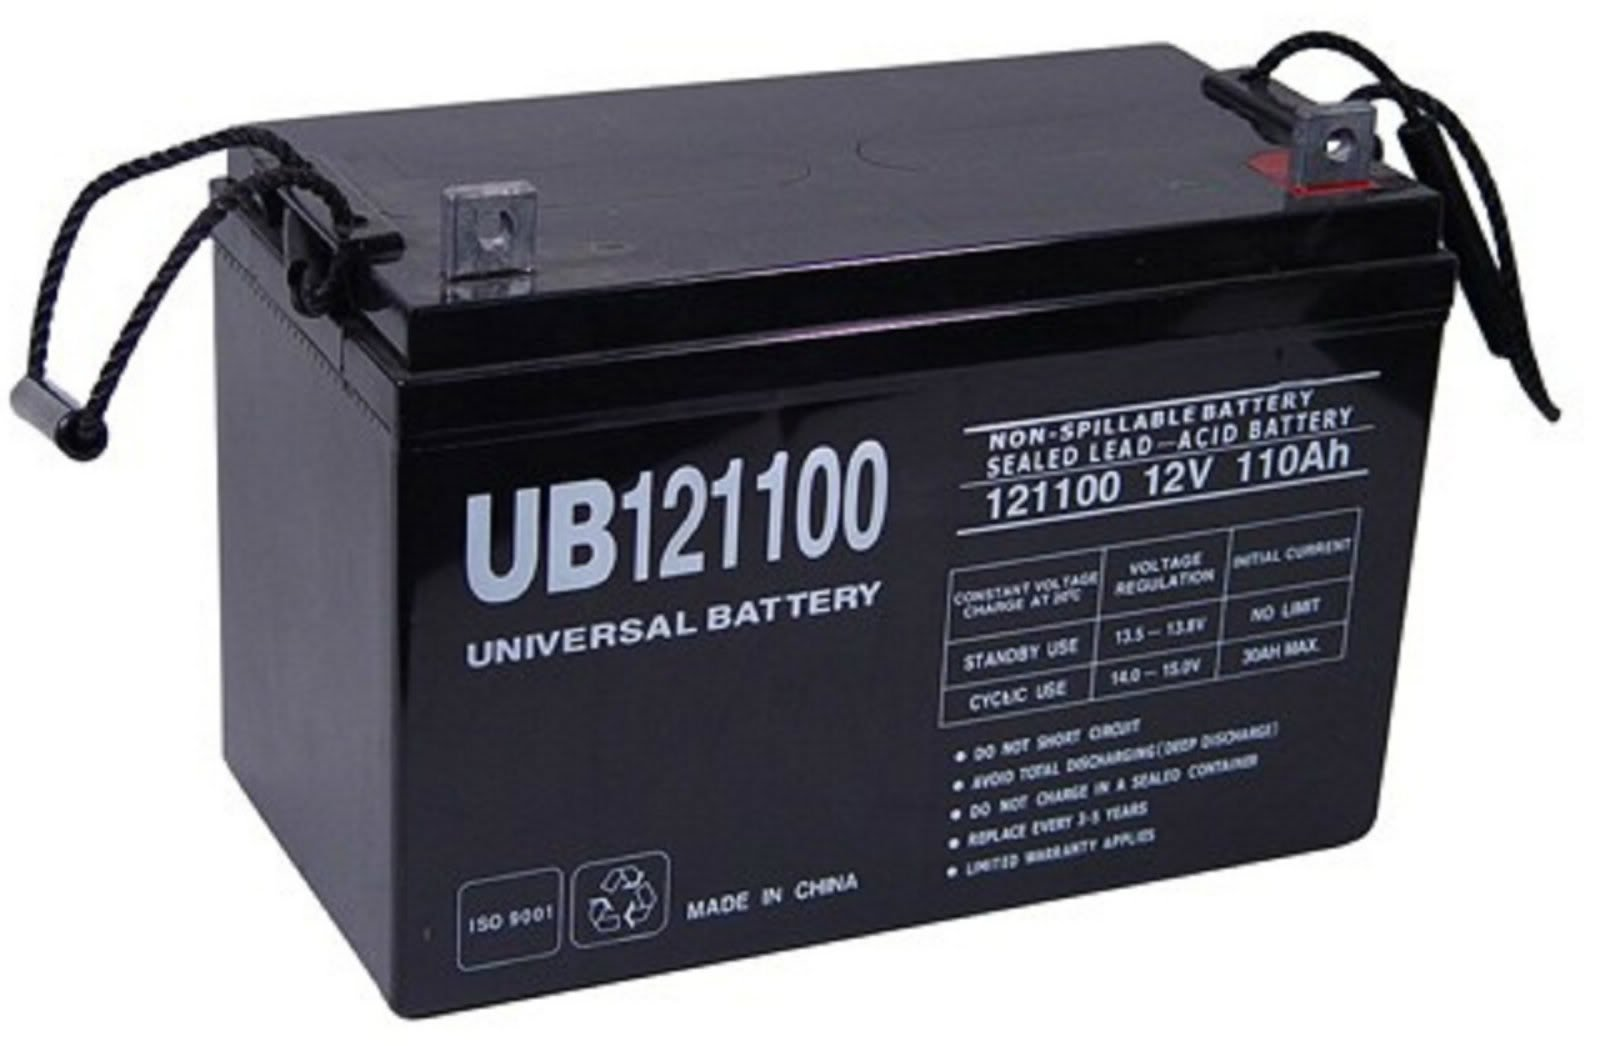 12 volt 110 ah sealed lead acid rechargeable battery with. Black Bedroom Furniture Sets. Home Design Ideas